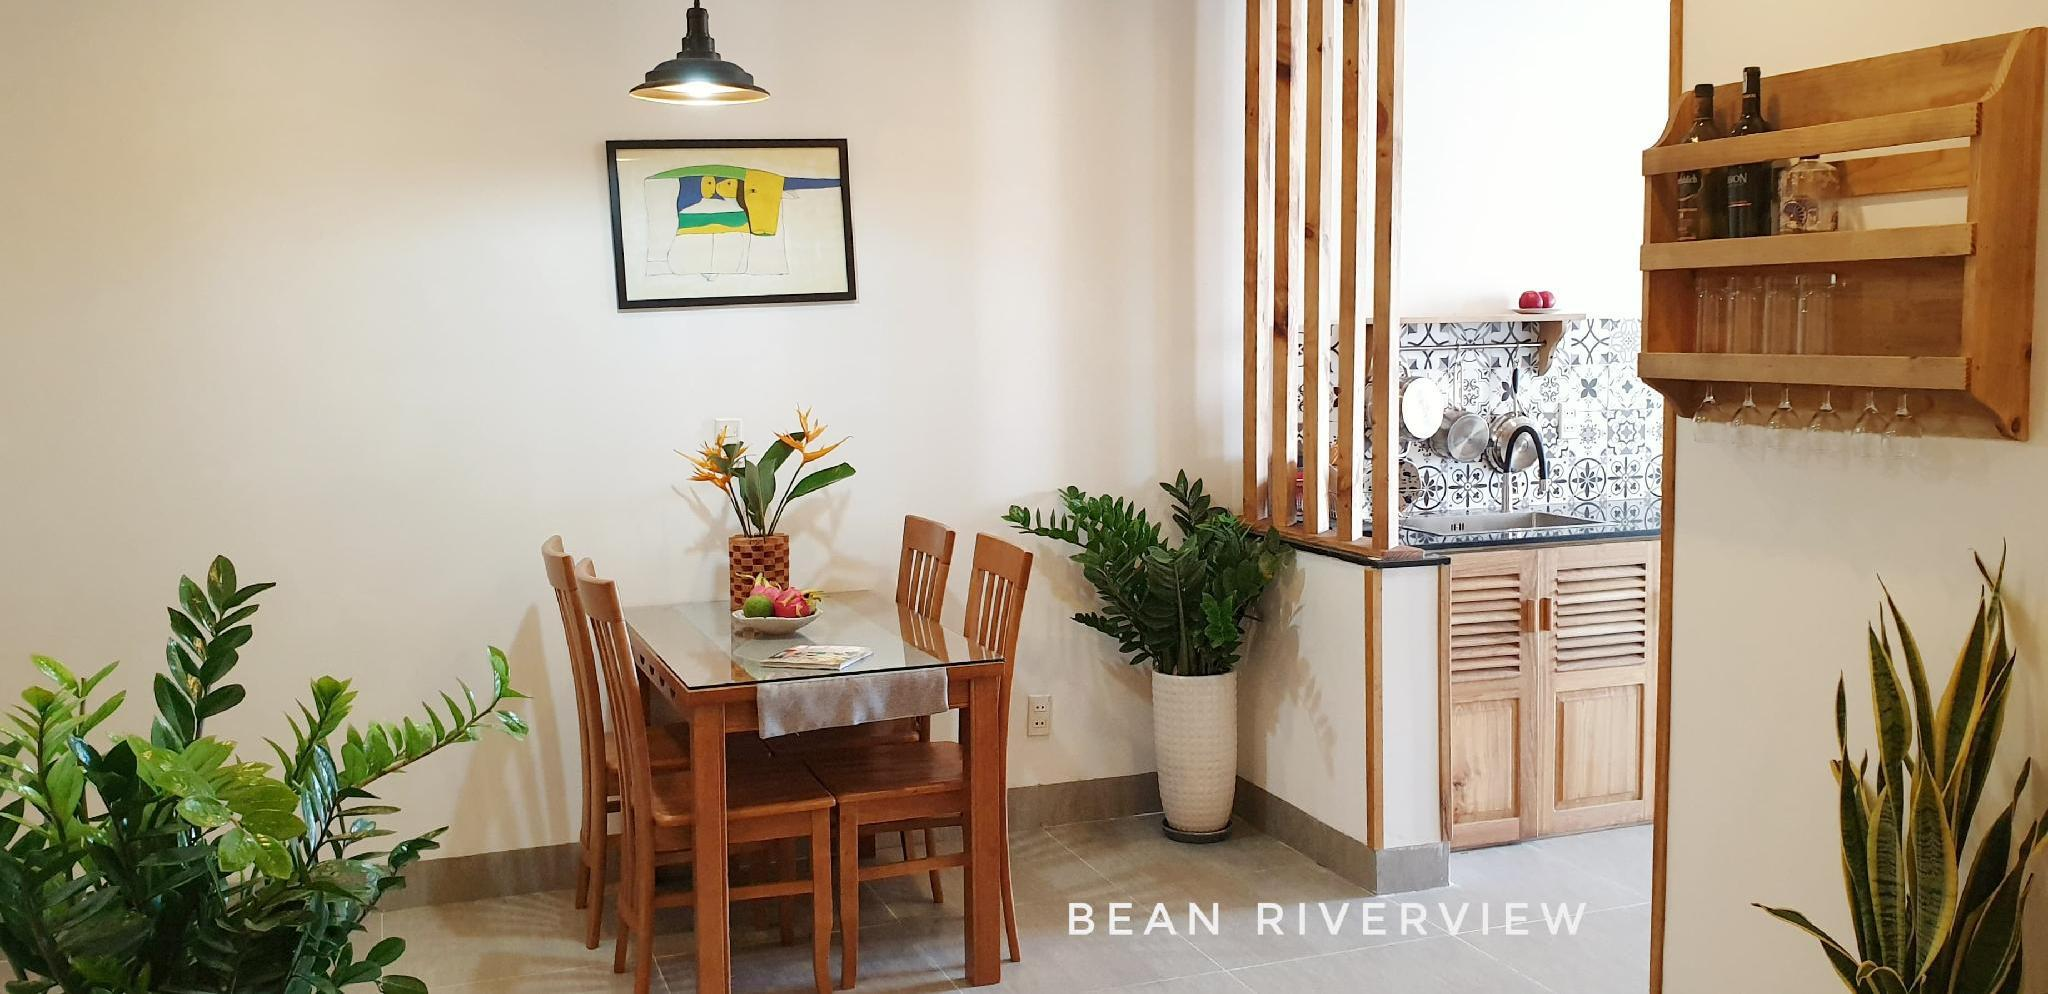 Bean Riverview Brand New Apt w Pool+Gym